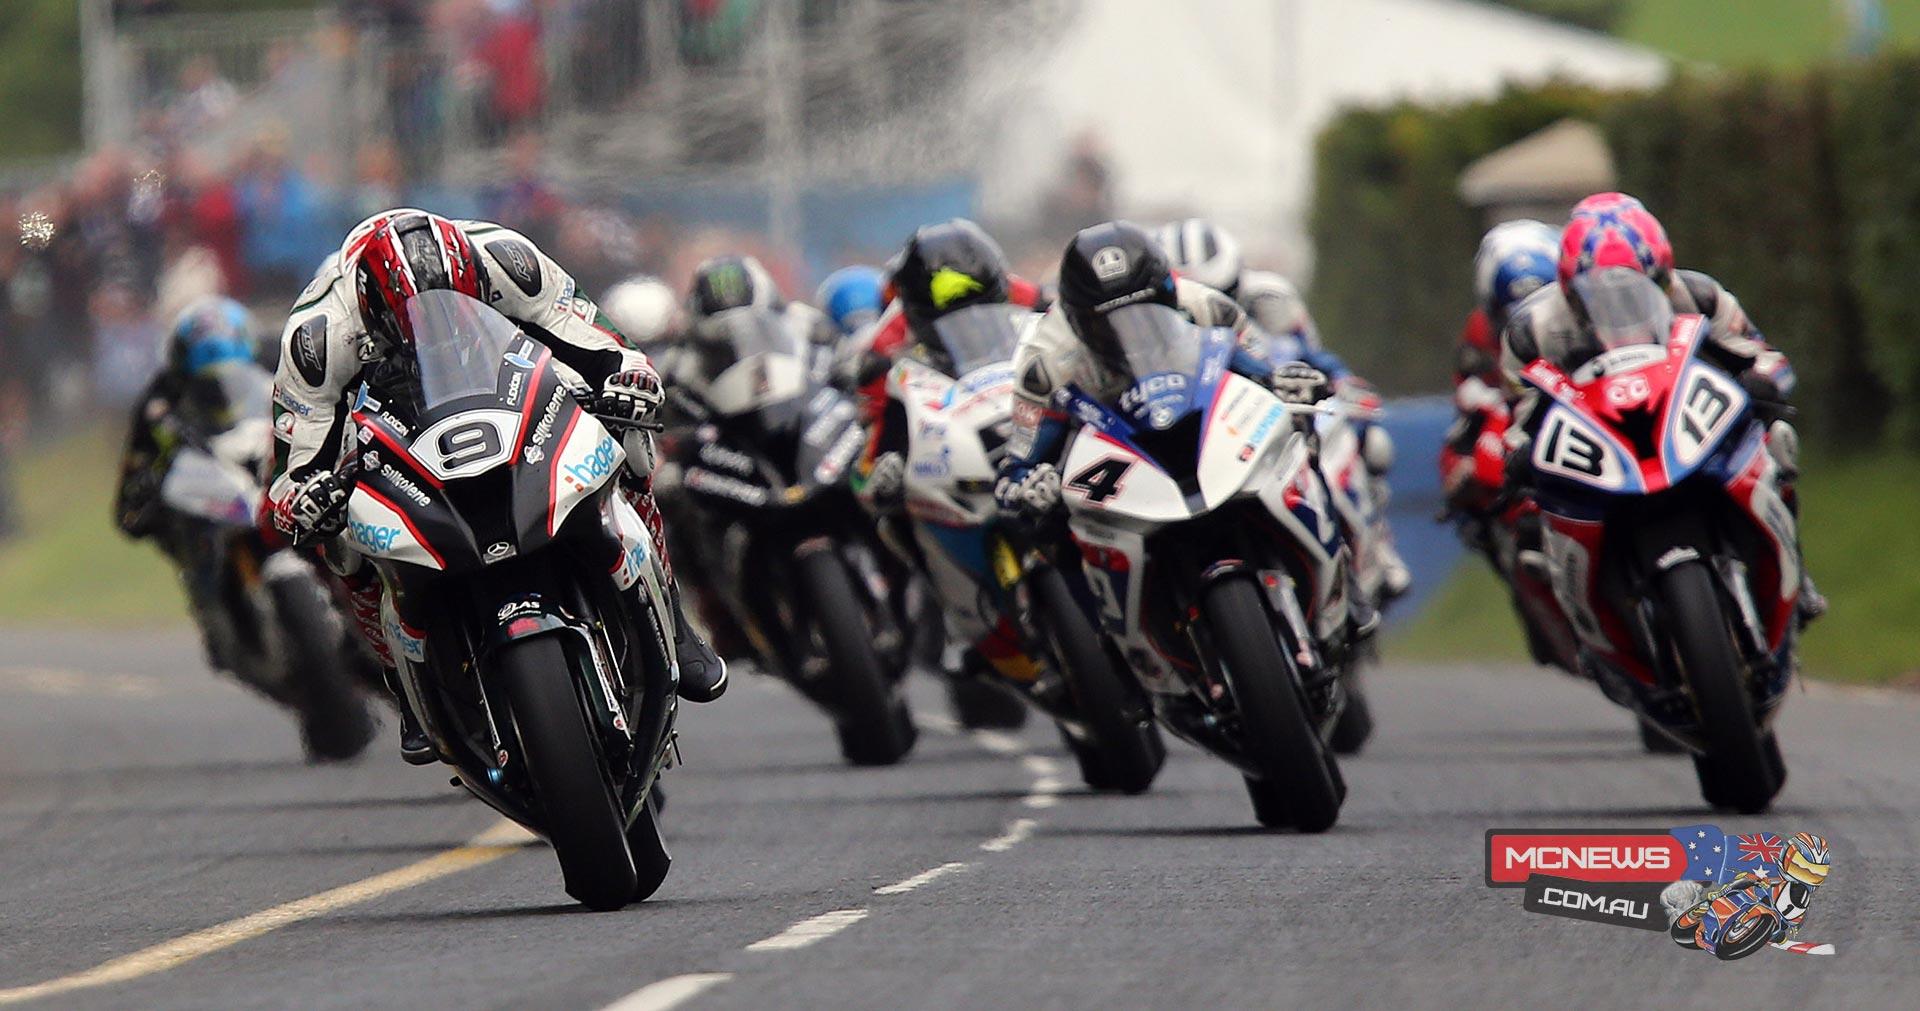 Dundrod 150 Superbike race 2015